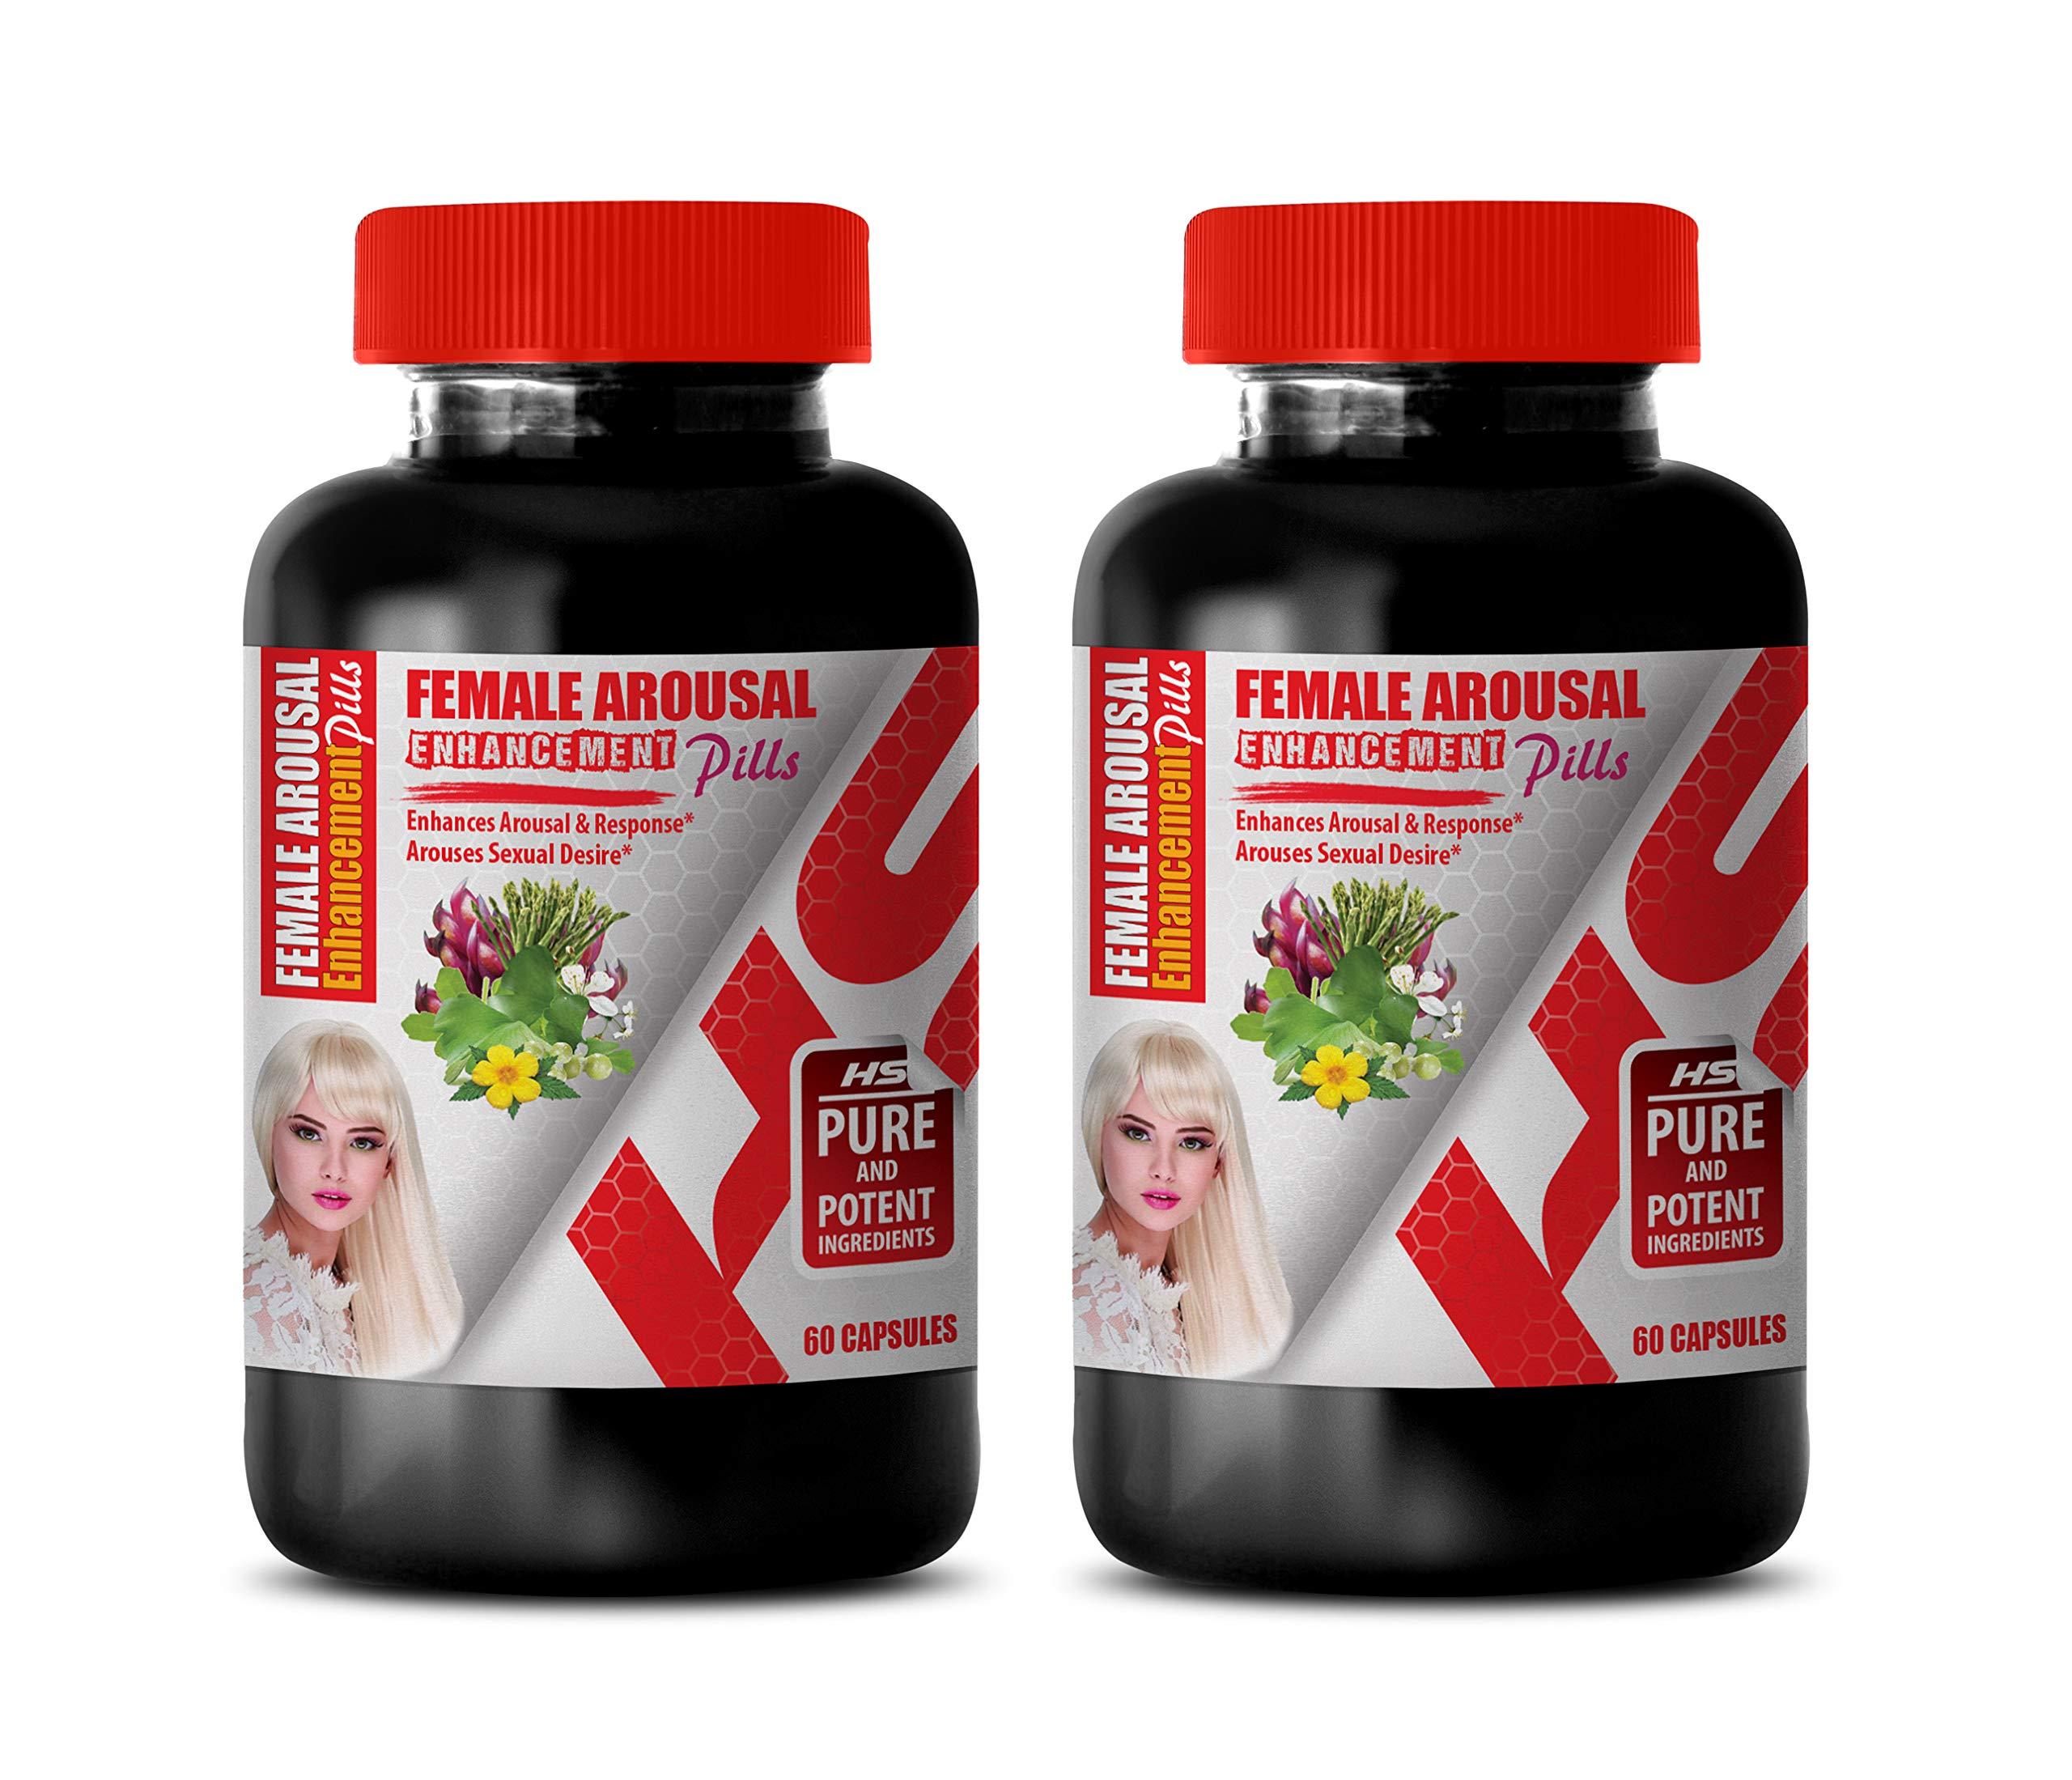 Sexual Enhancement for Women - Female Arousal Enhancement Pills Complex - tribulus terrestris and l arginine - 2 Bottles 120 Capsules